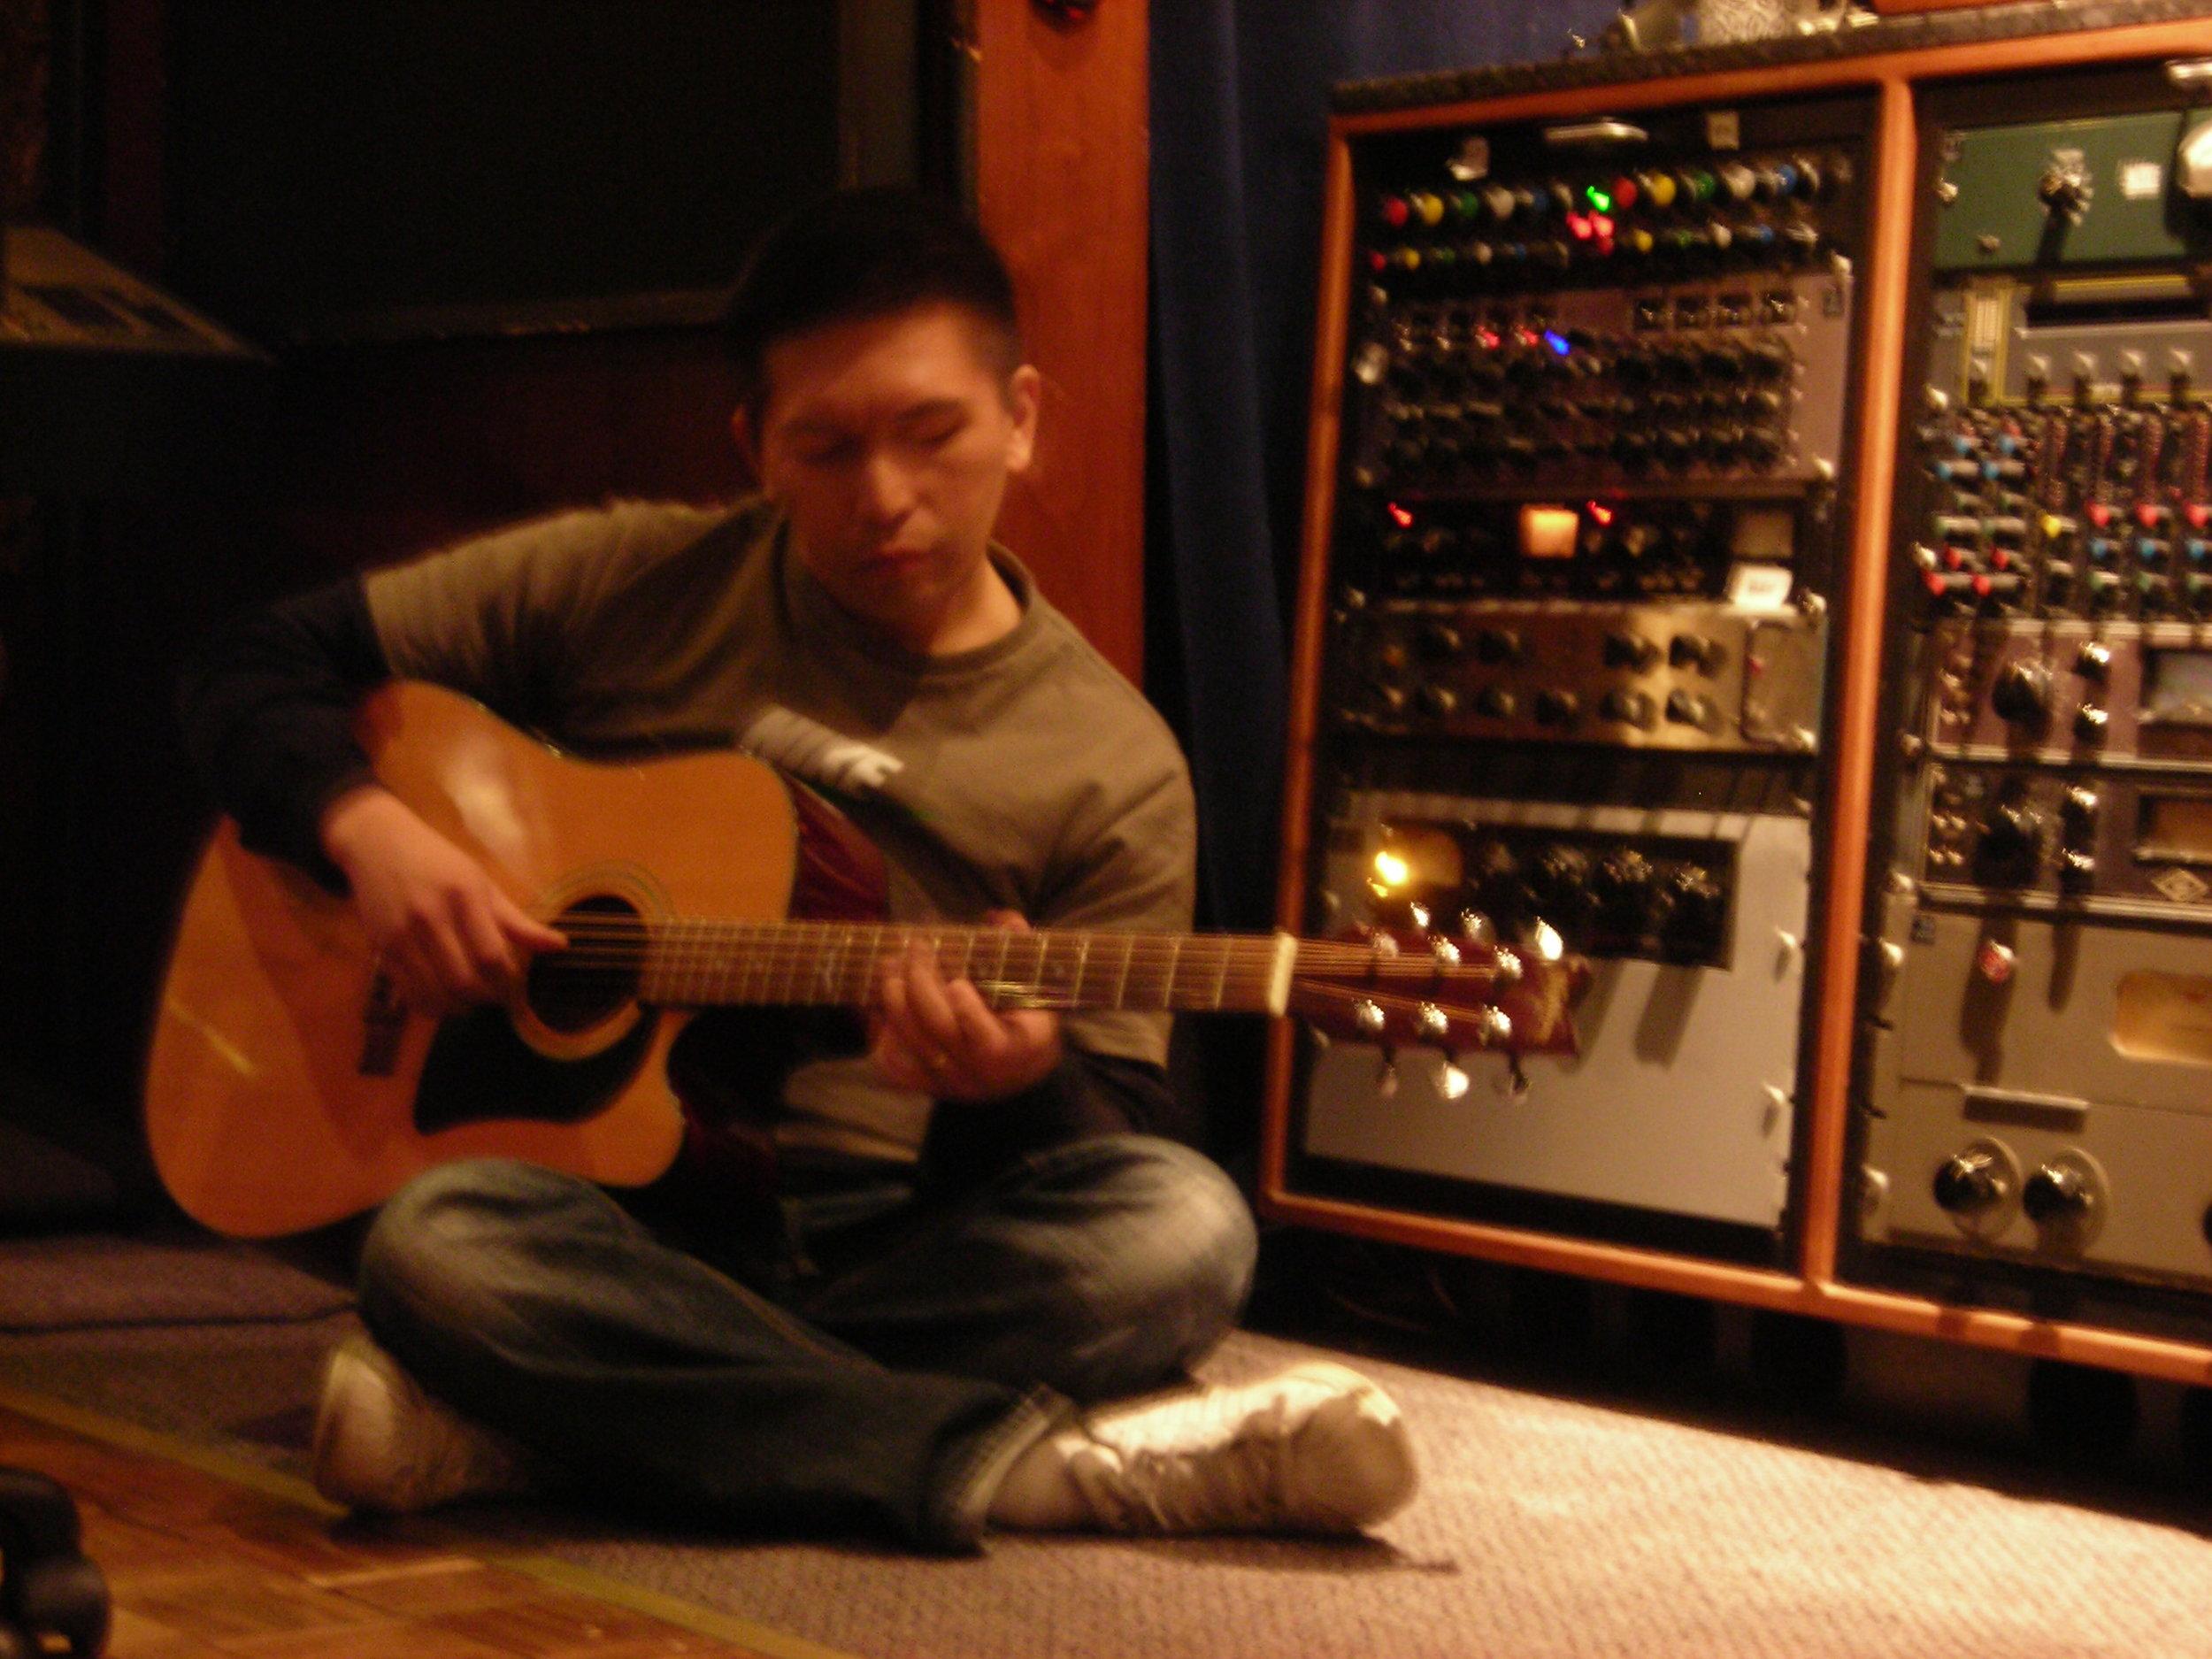 Throwback - Mushroom Studios / Stef Lang Sessions